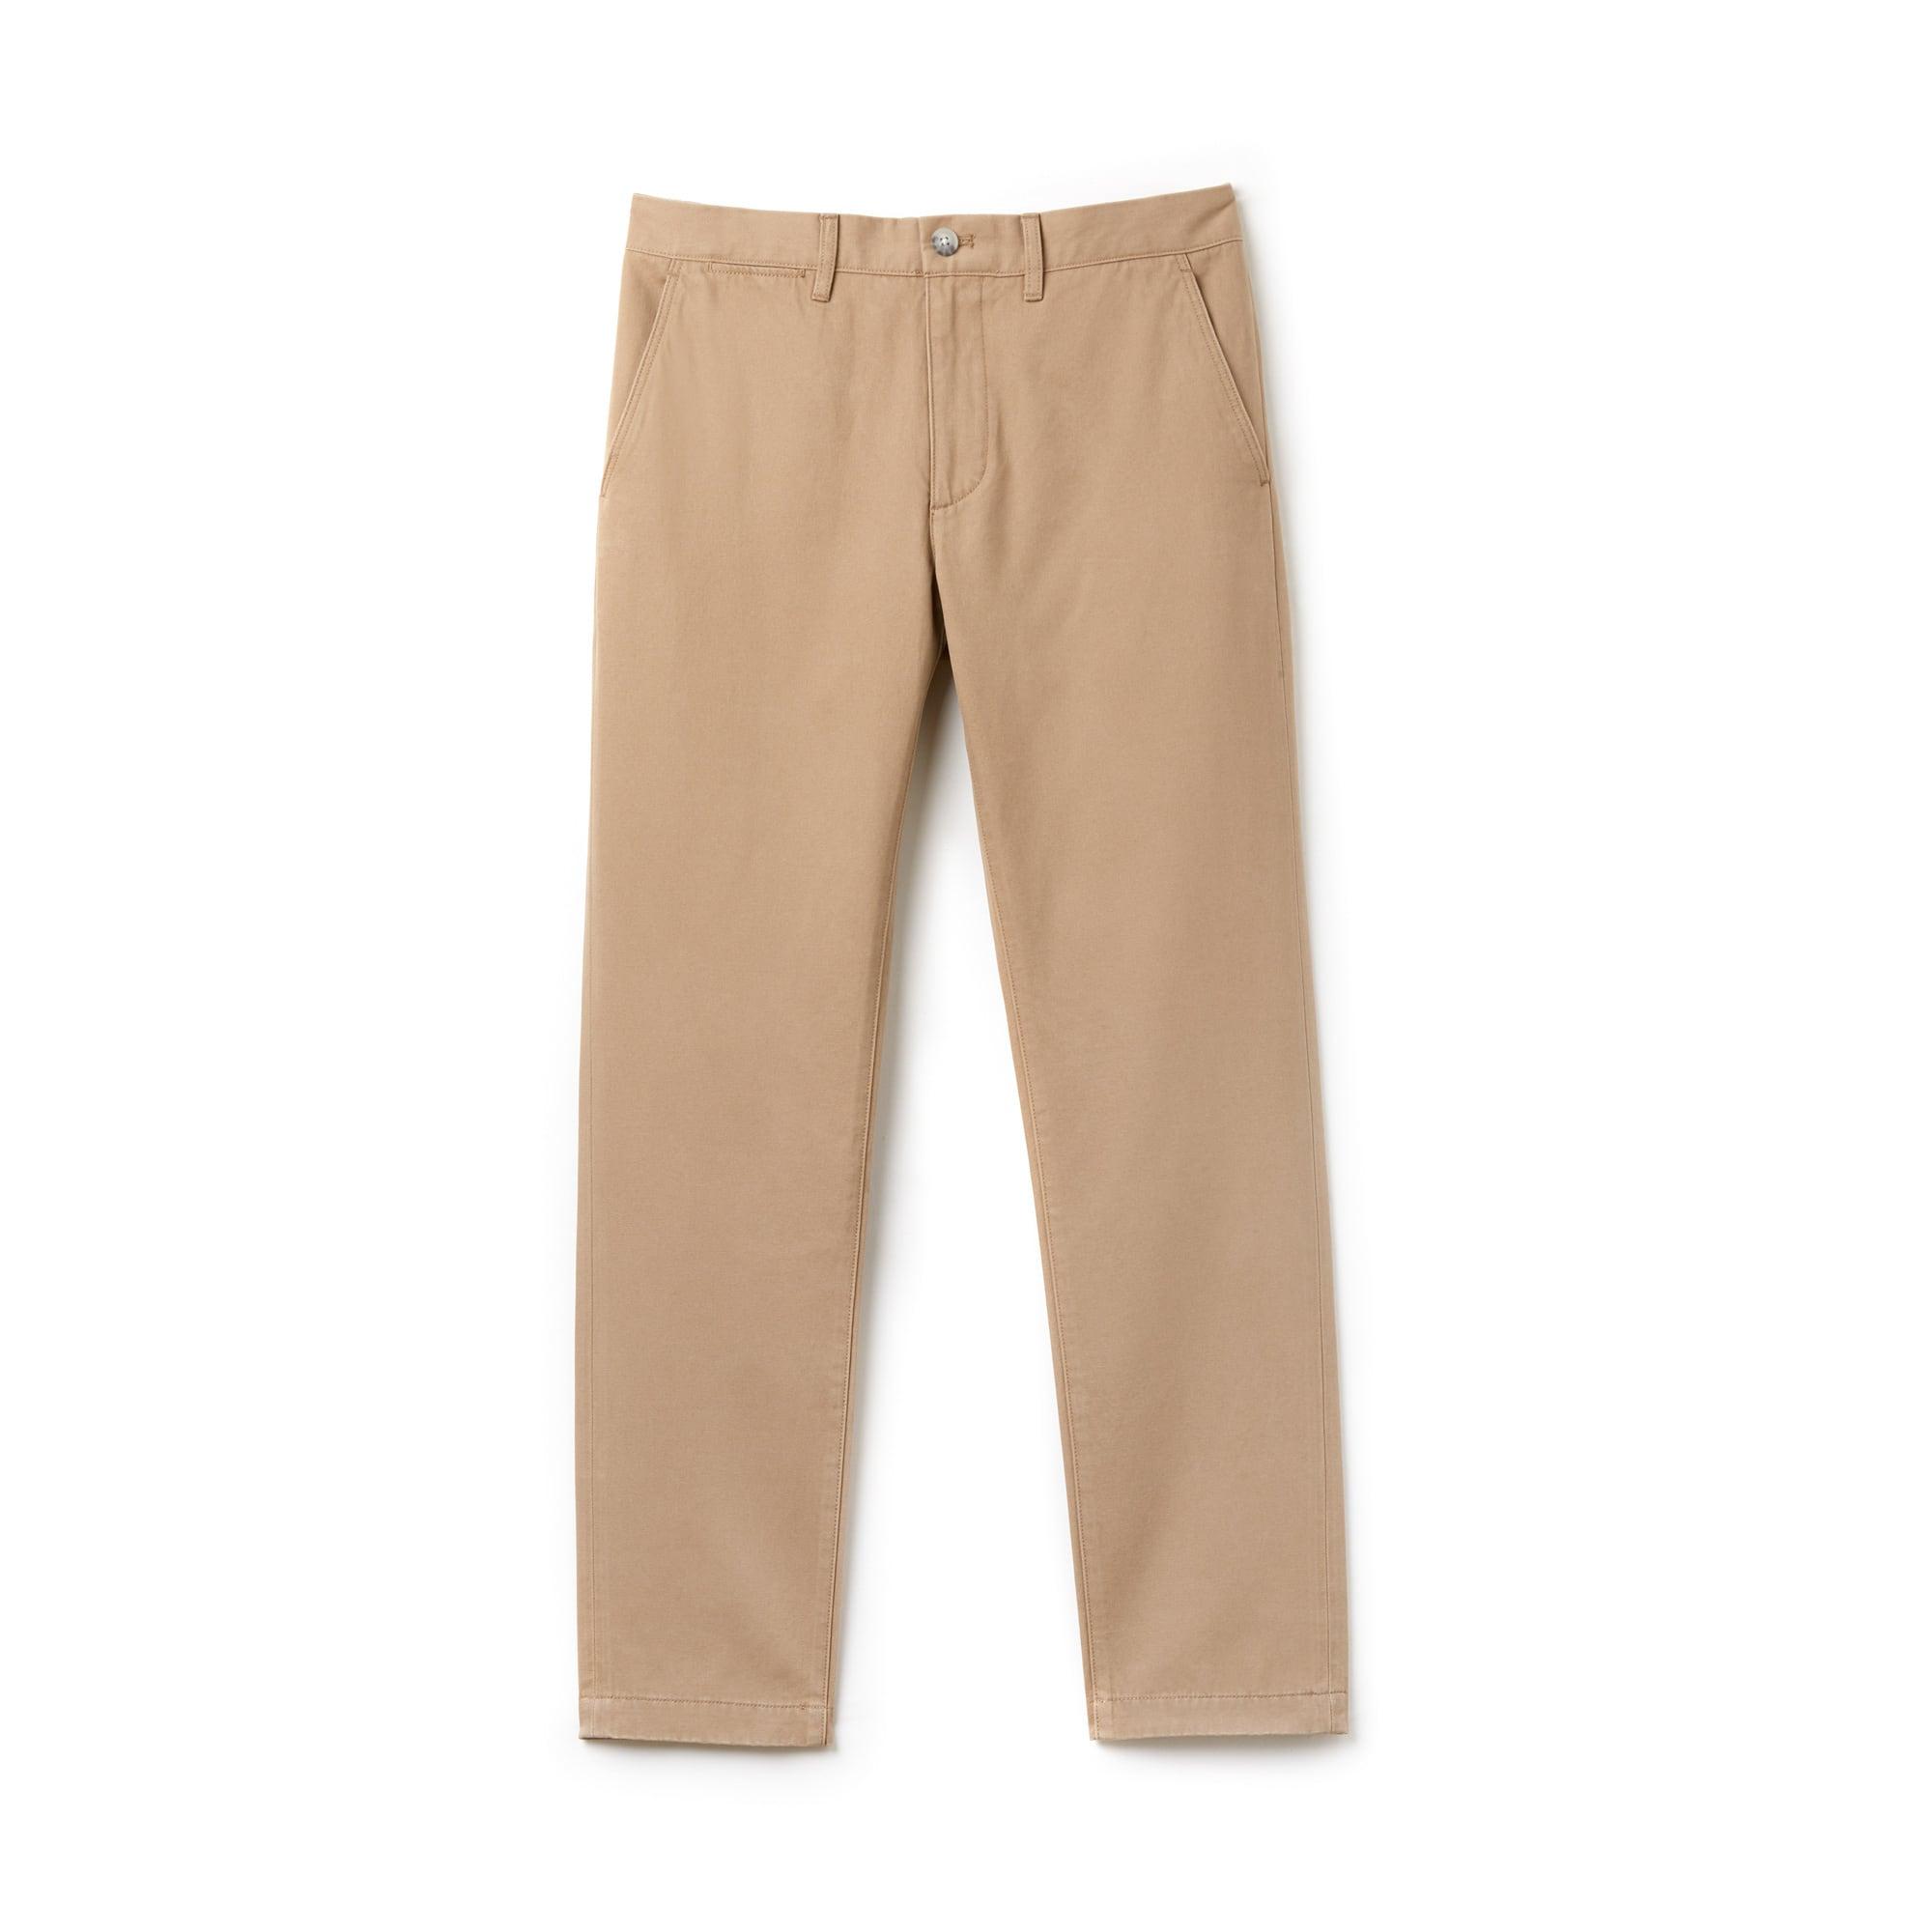 Pantaloni chino regular fit in gabardine di cotone tinta unita